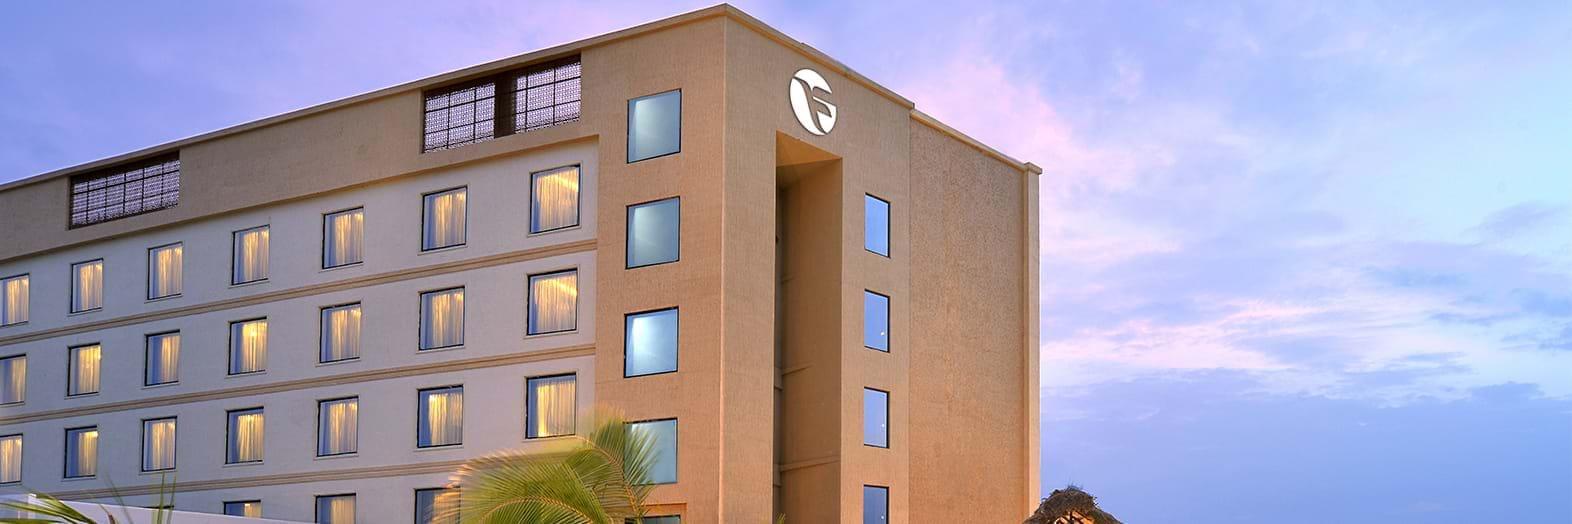 Hotels in Tirupati - Fortune Select Grand Ridge